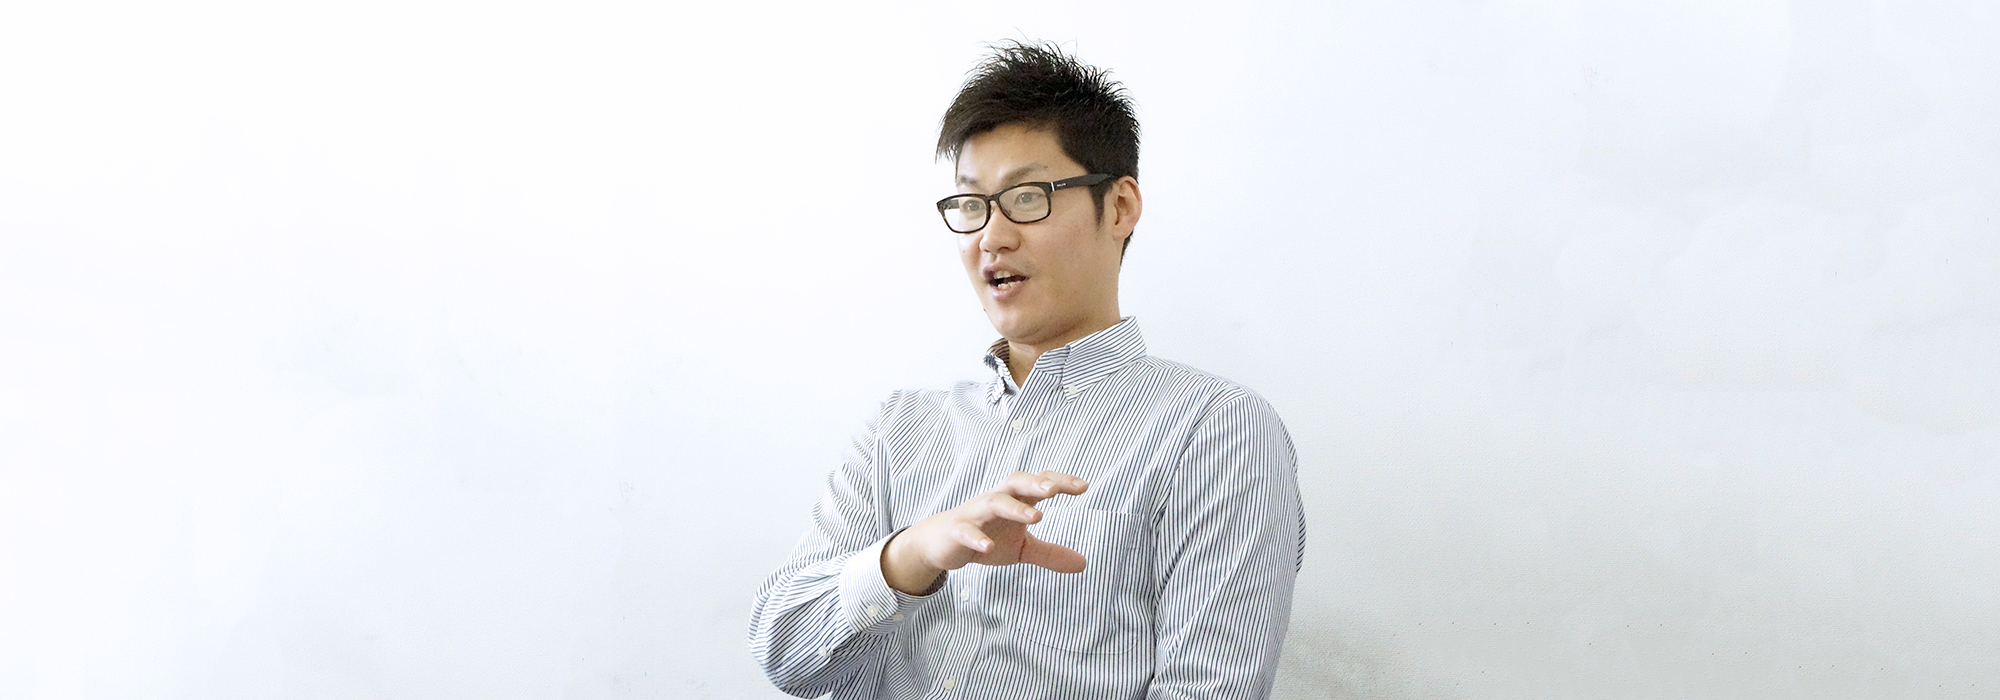 JOYFIT(ジョイフィット)武田 充展|フィットネス事業部マネージャー